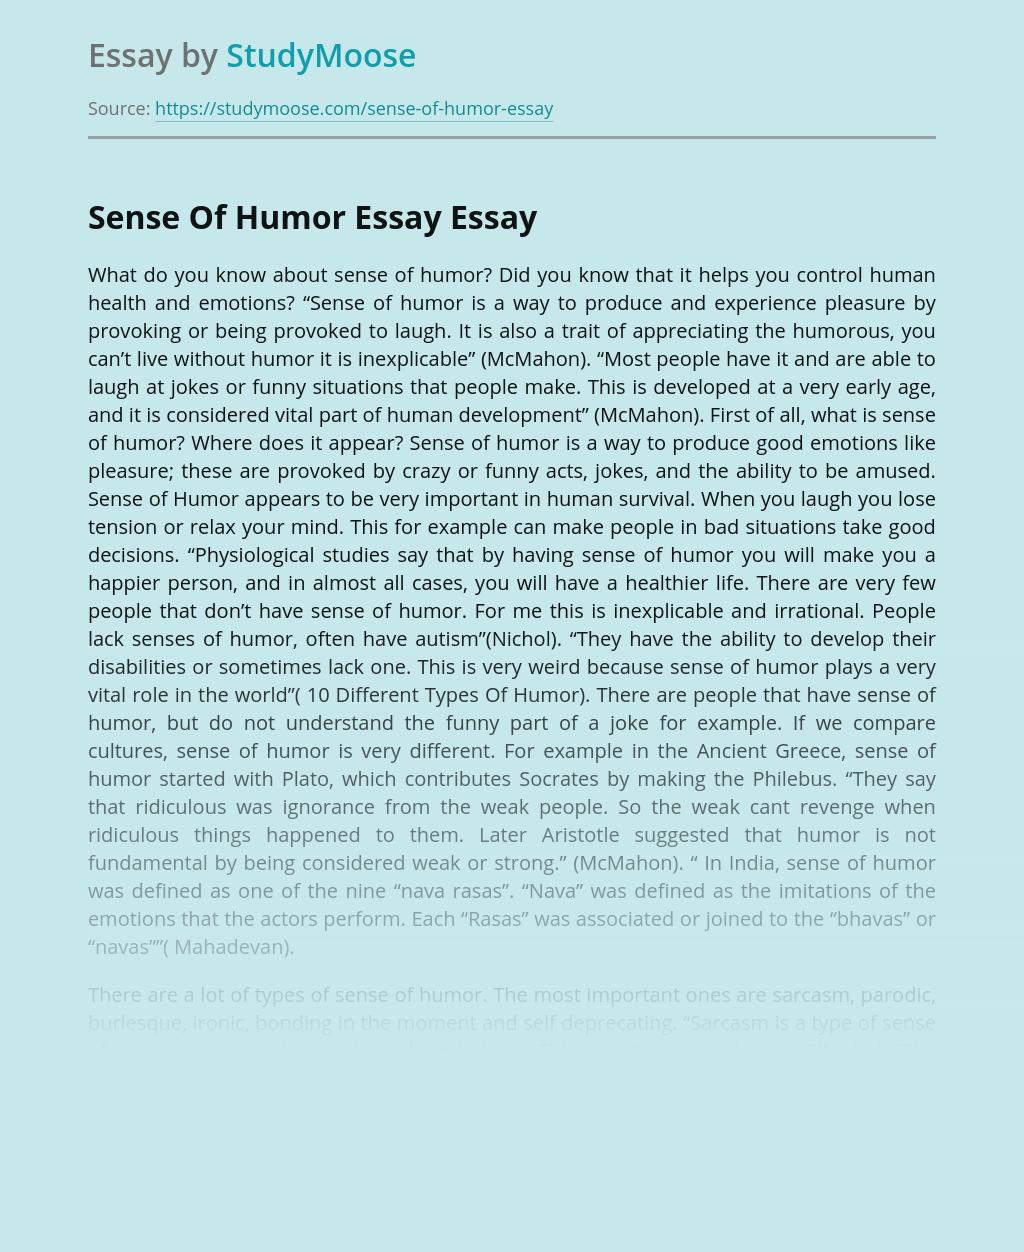 essay on sense of humor